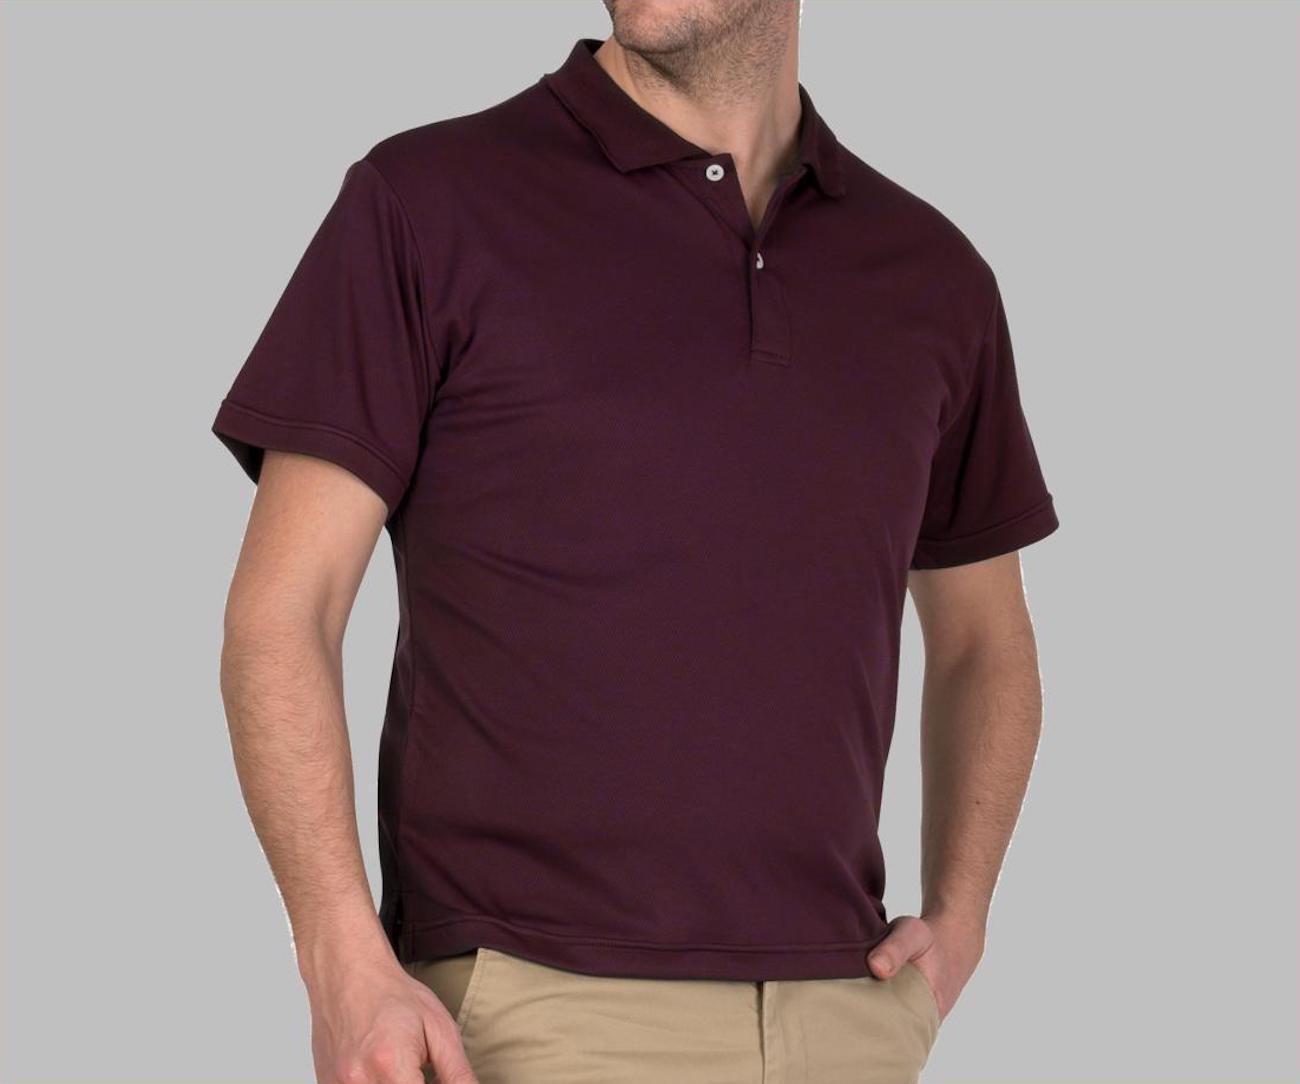 NanoDri Sweatproof Polo Shirts